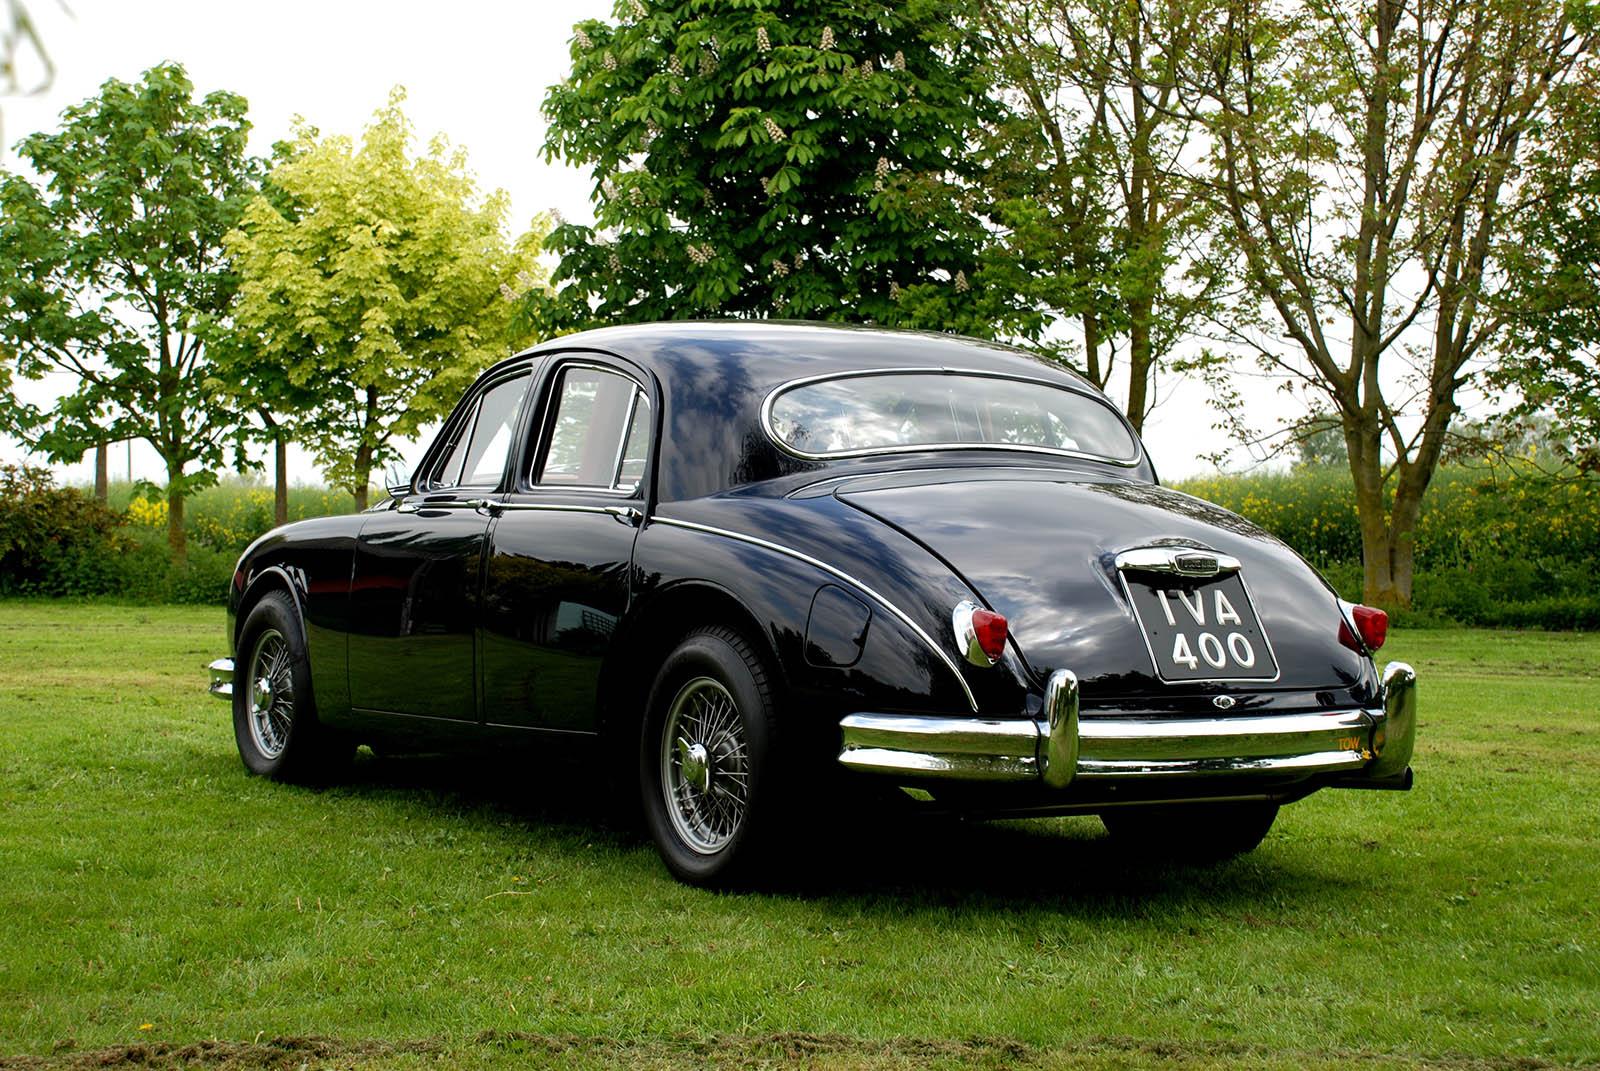 1959 bscc_Jaguar_competition_mk I_sayer selection_scragg_wilkinson_iva400_web_14.jpg